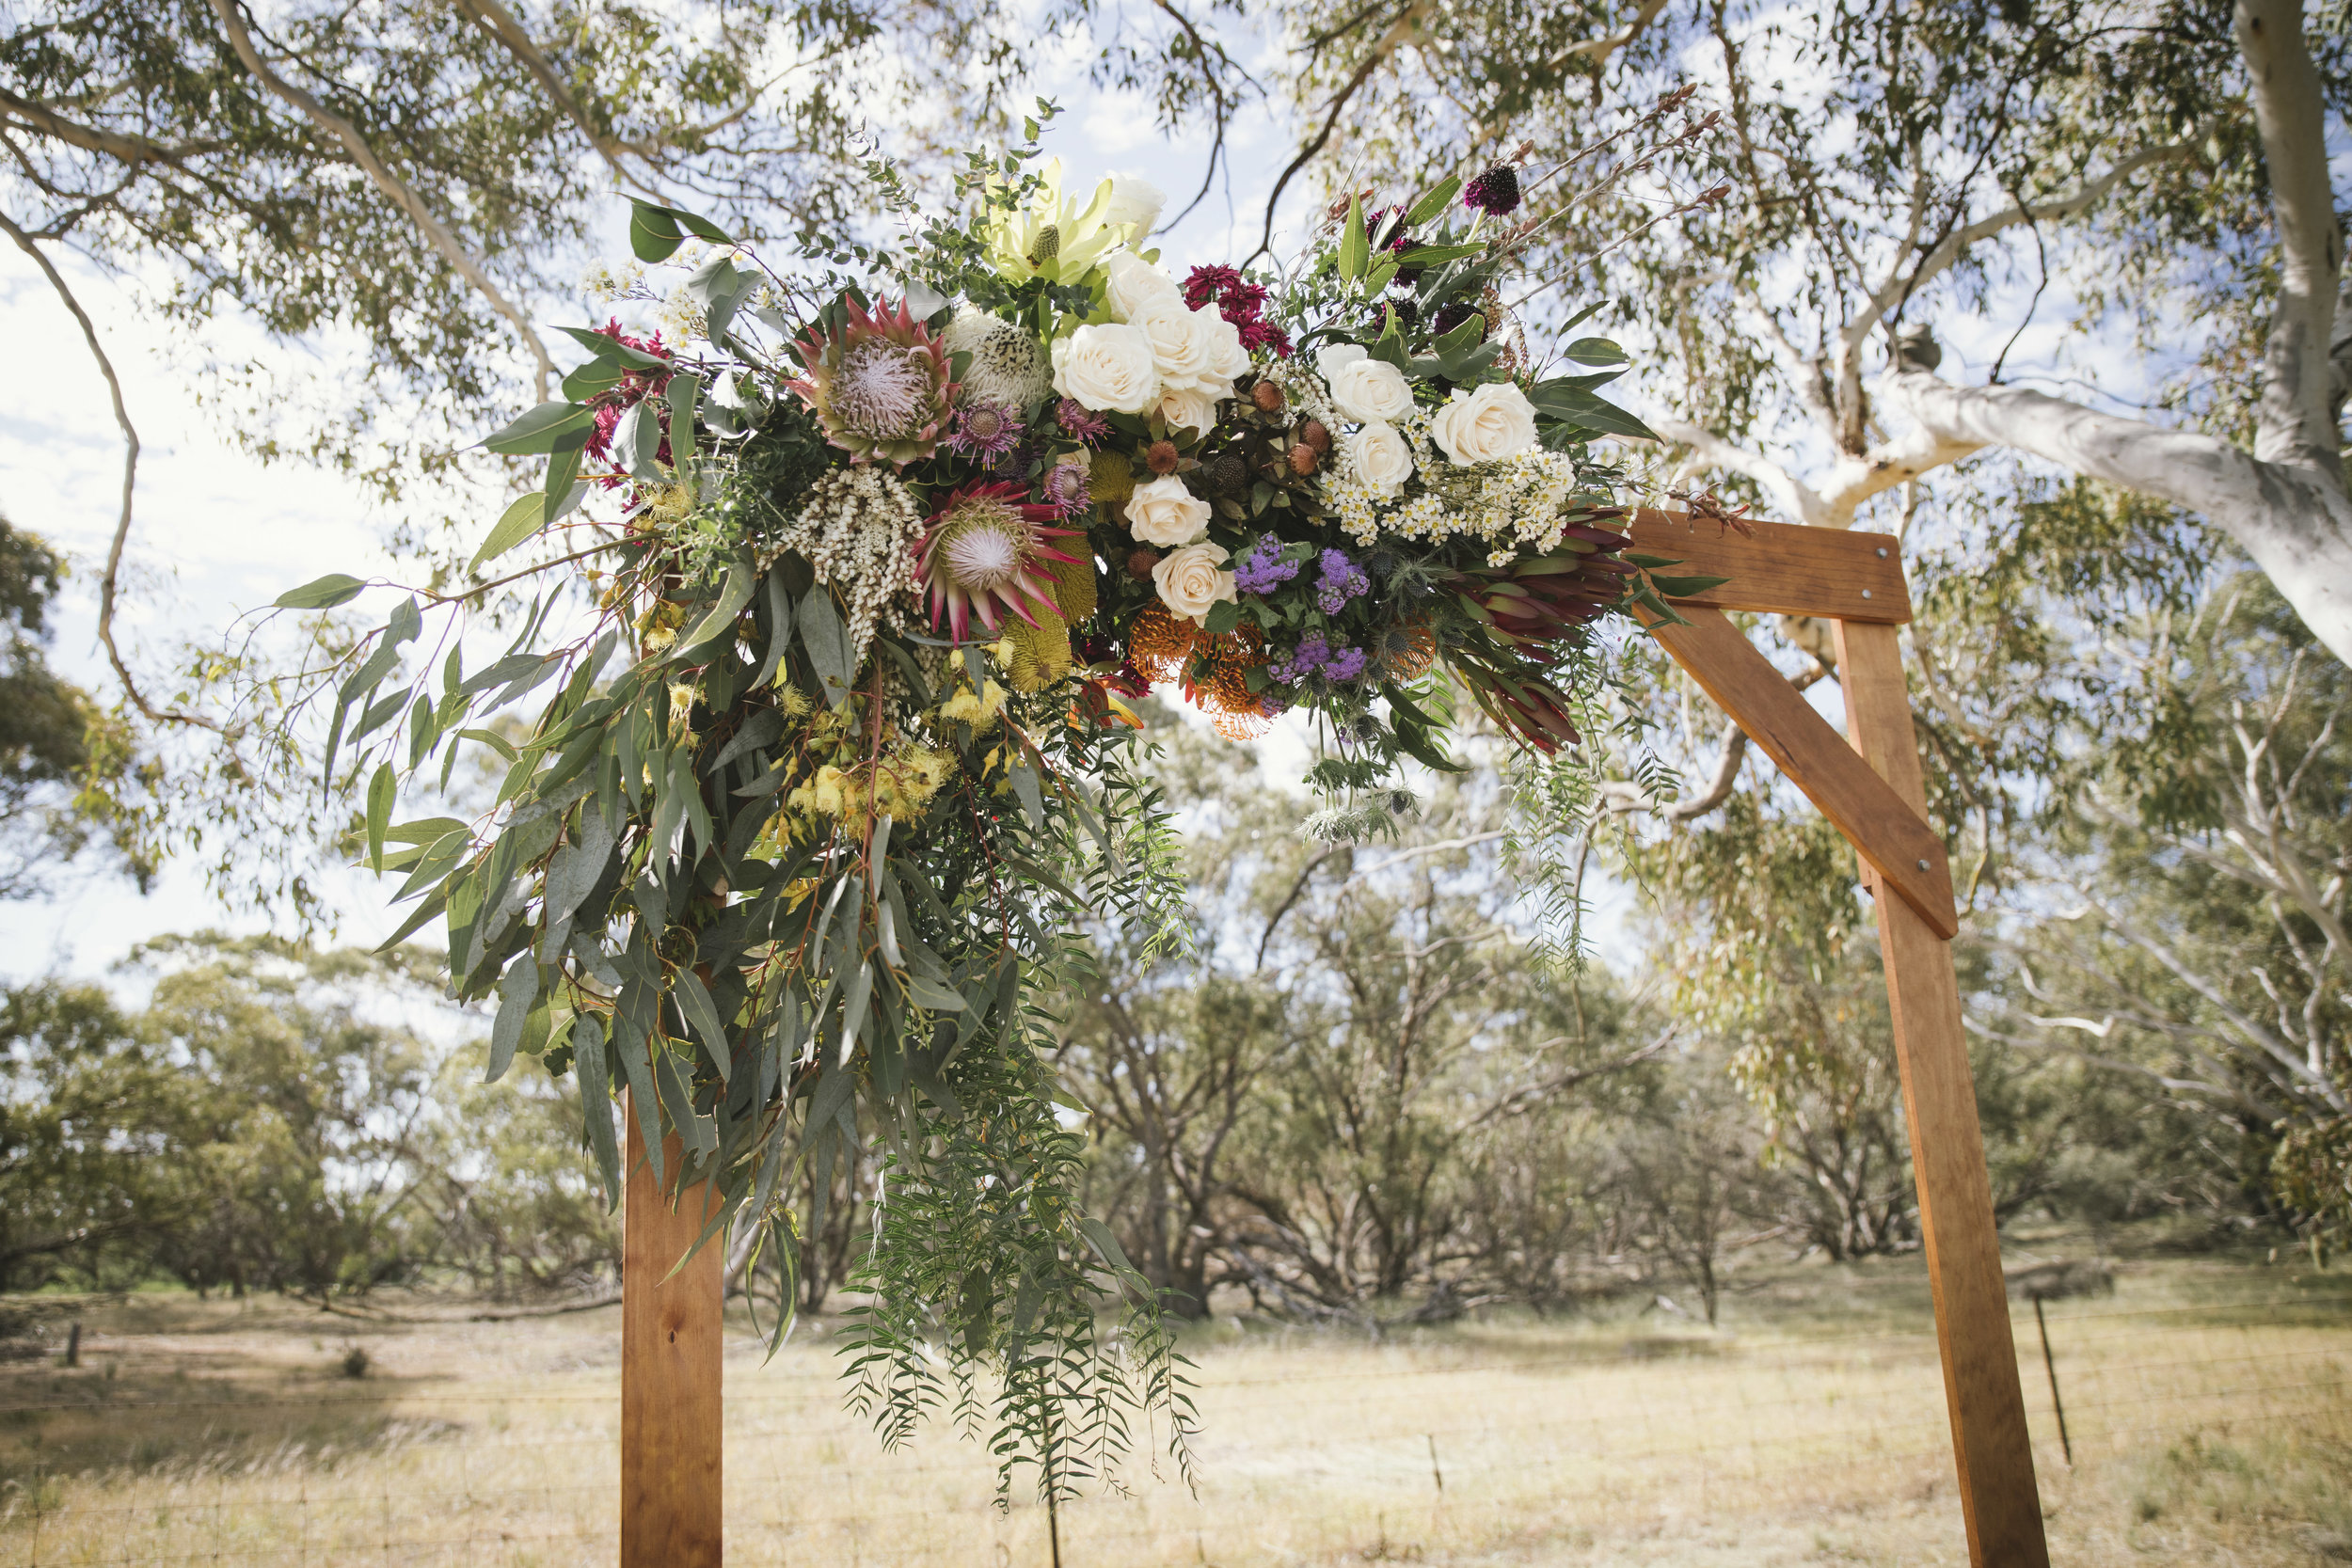 Angie Roe Photography Wheatbelt Avon Valley Farm Wedding (10).jpg